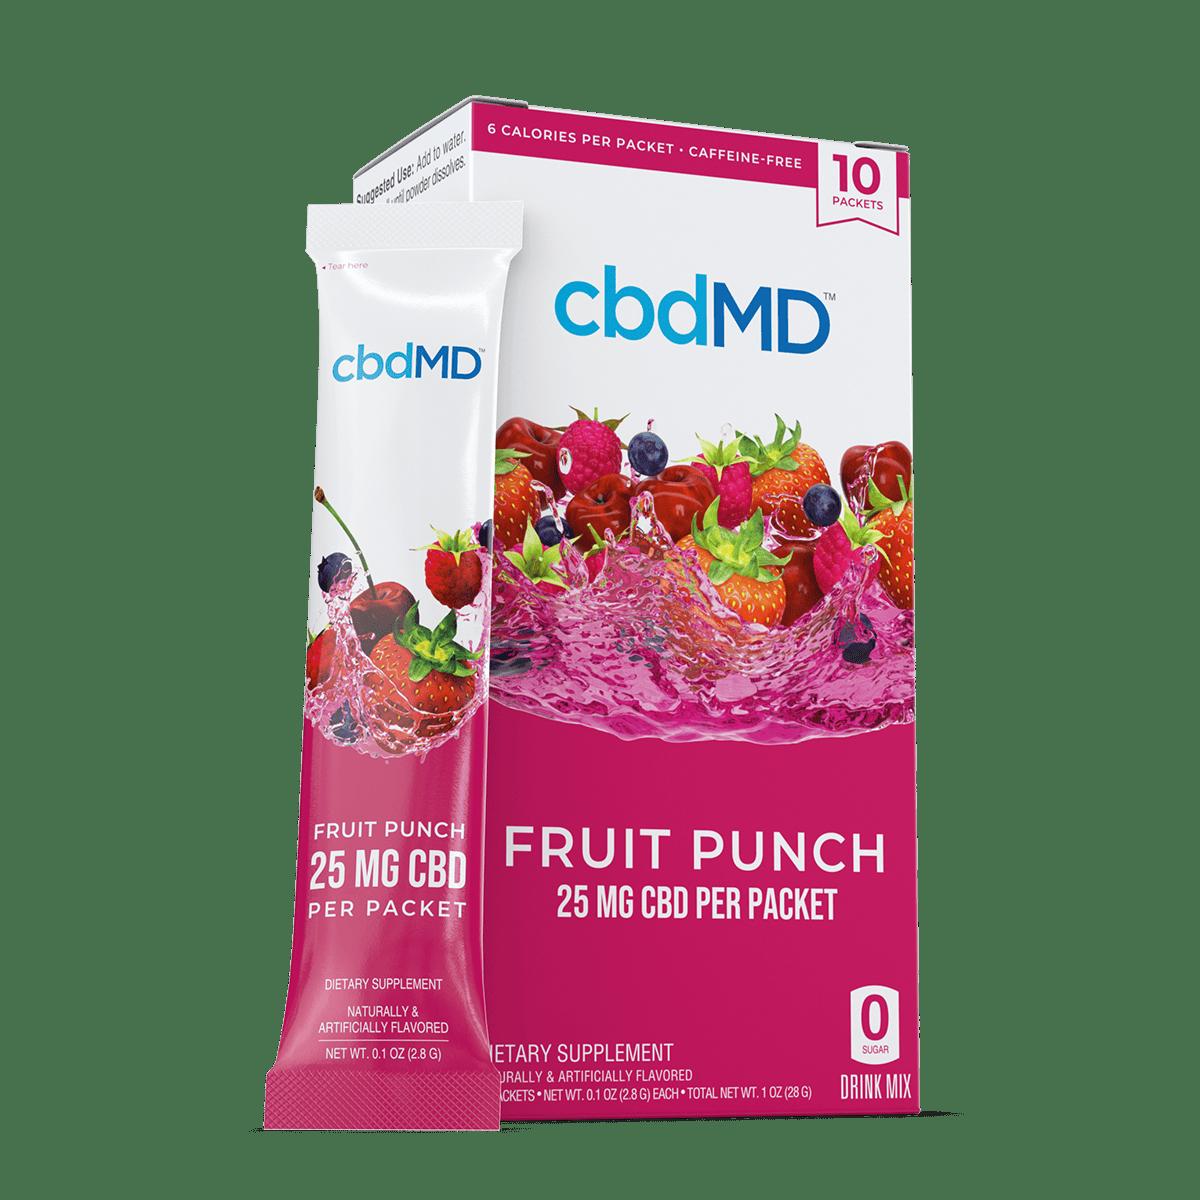 cbdMD, CBD Powdered Drink Mix, Broad Spectrum THC-Free, Fruit Punch, 10ct, 250mg CBD 1